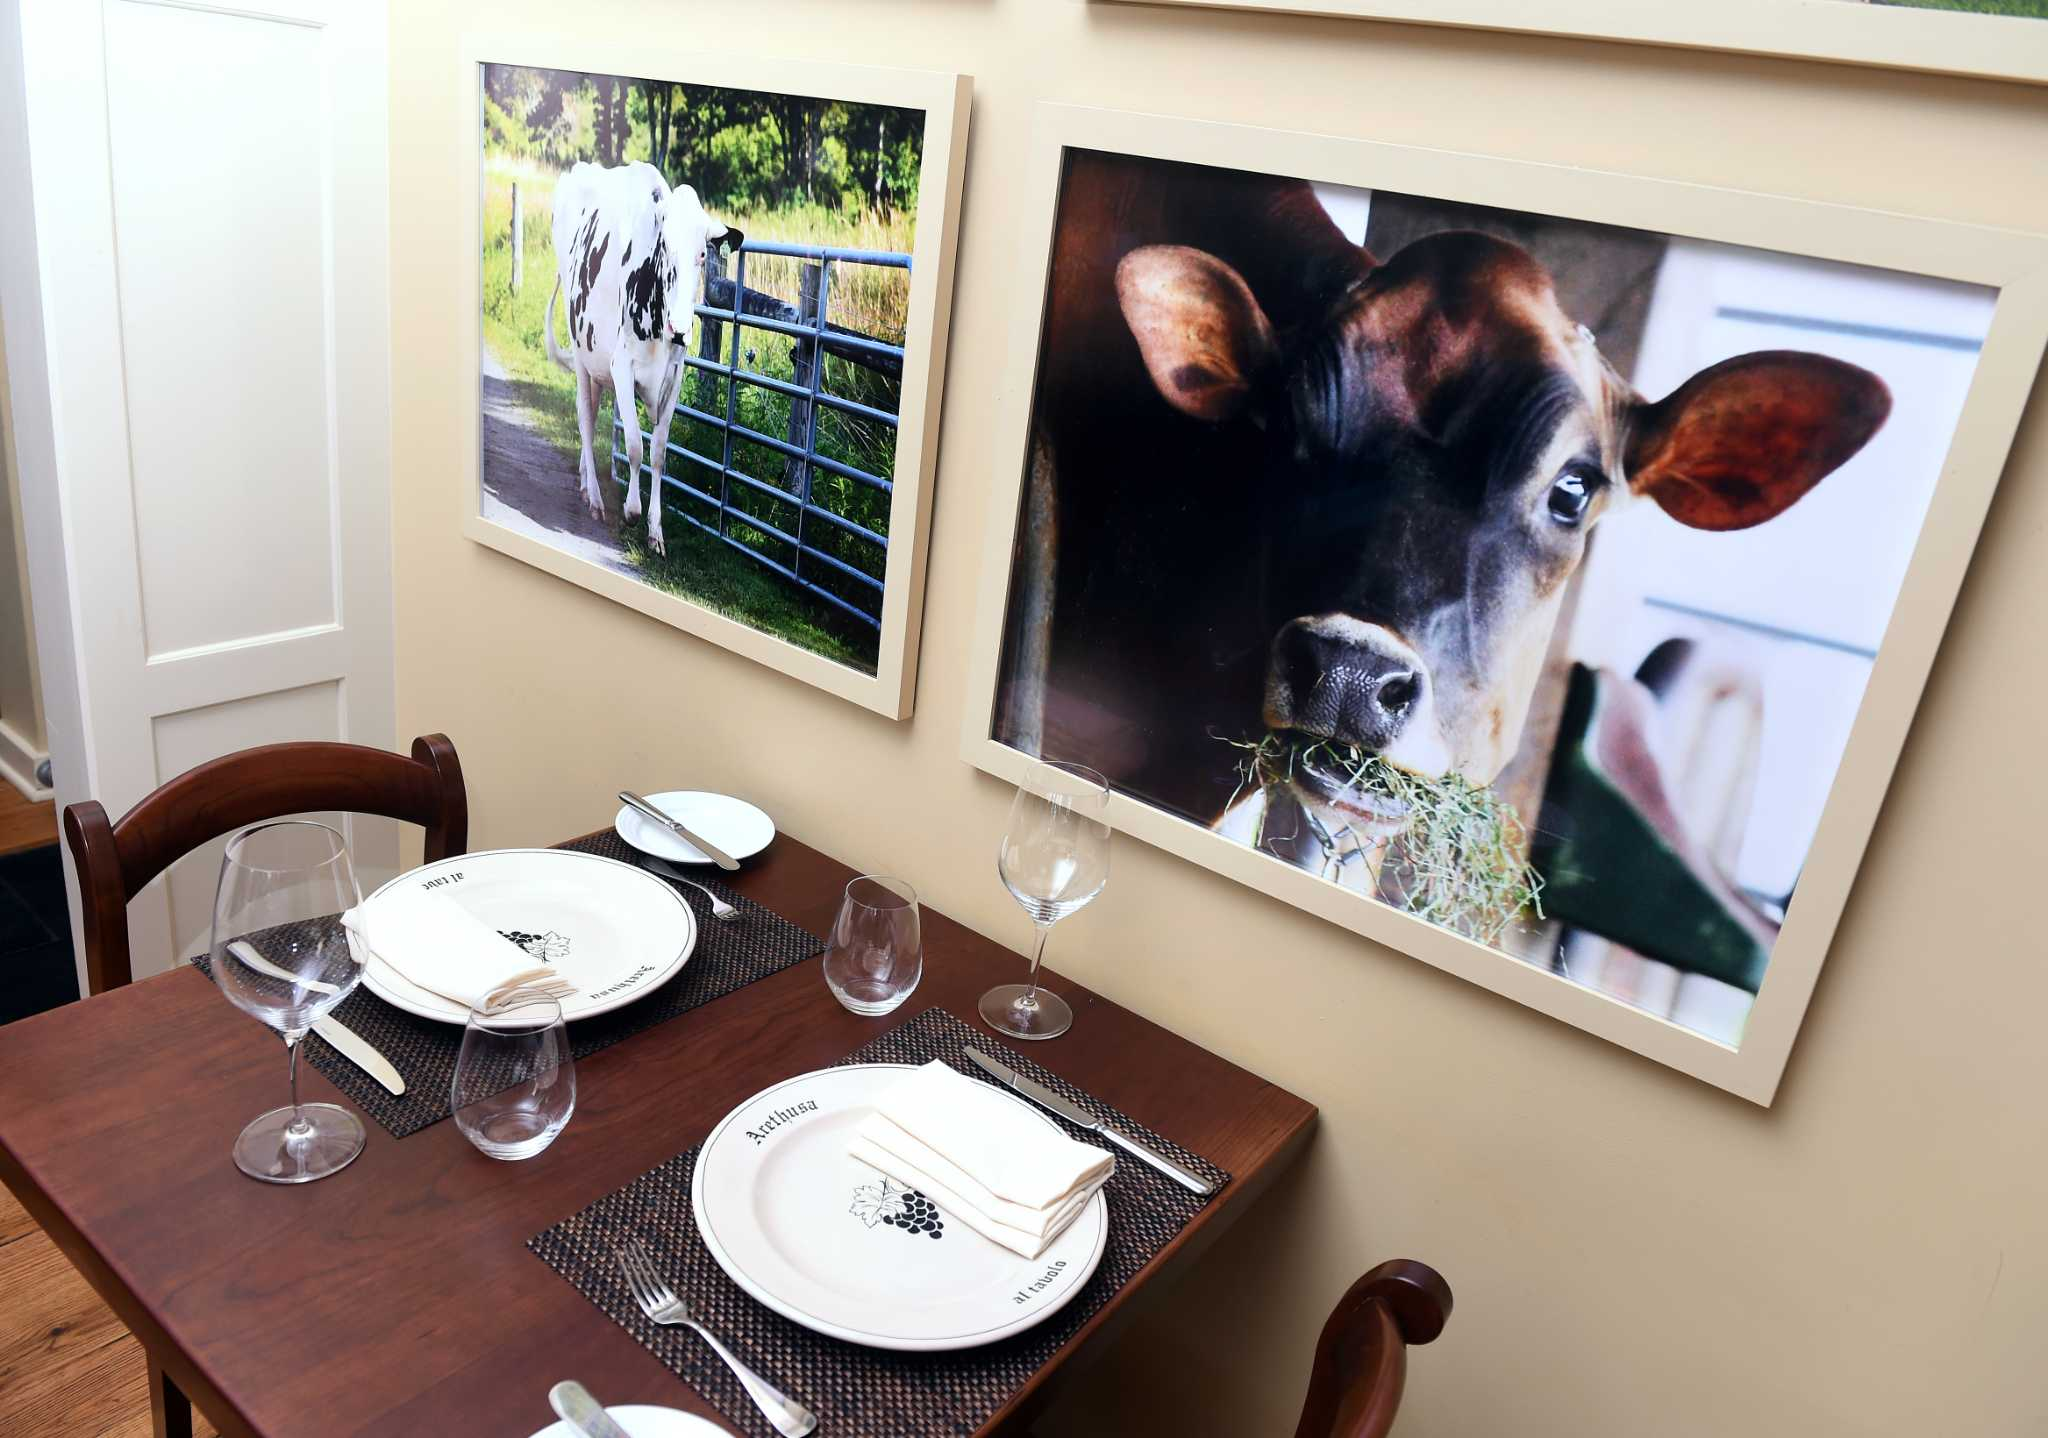 www.ctpost.com: CT Magazine: Best Restaurants 2021: The Top 15 Restaurants in Connecticut